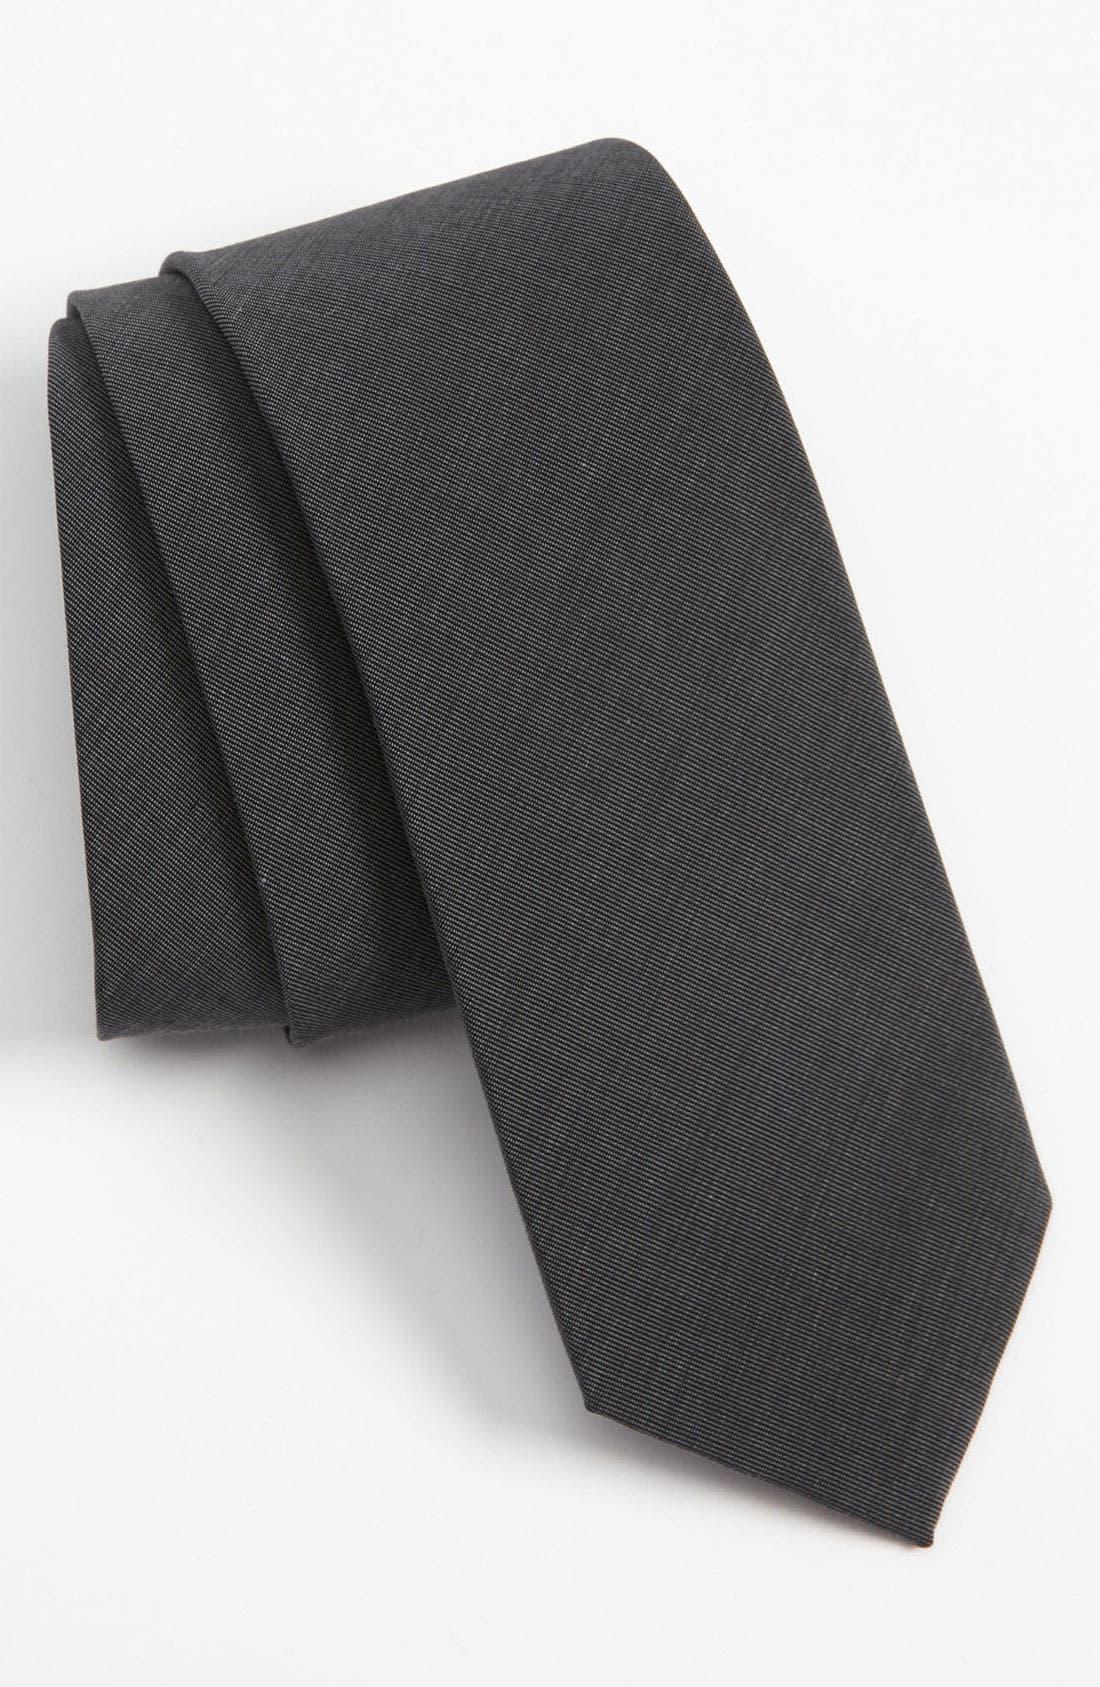 Main Image - The Tie Bar Solid Cotton Tie